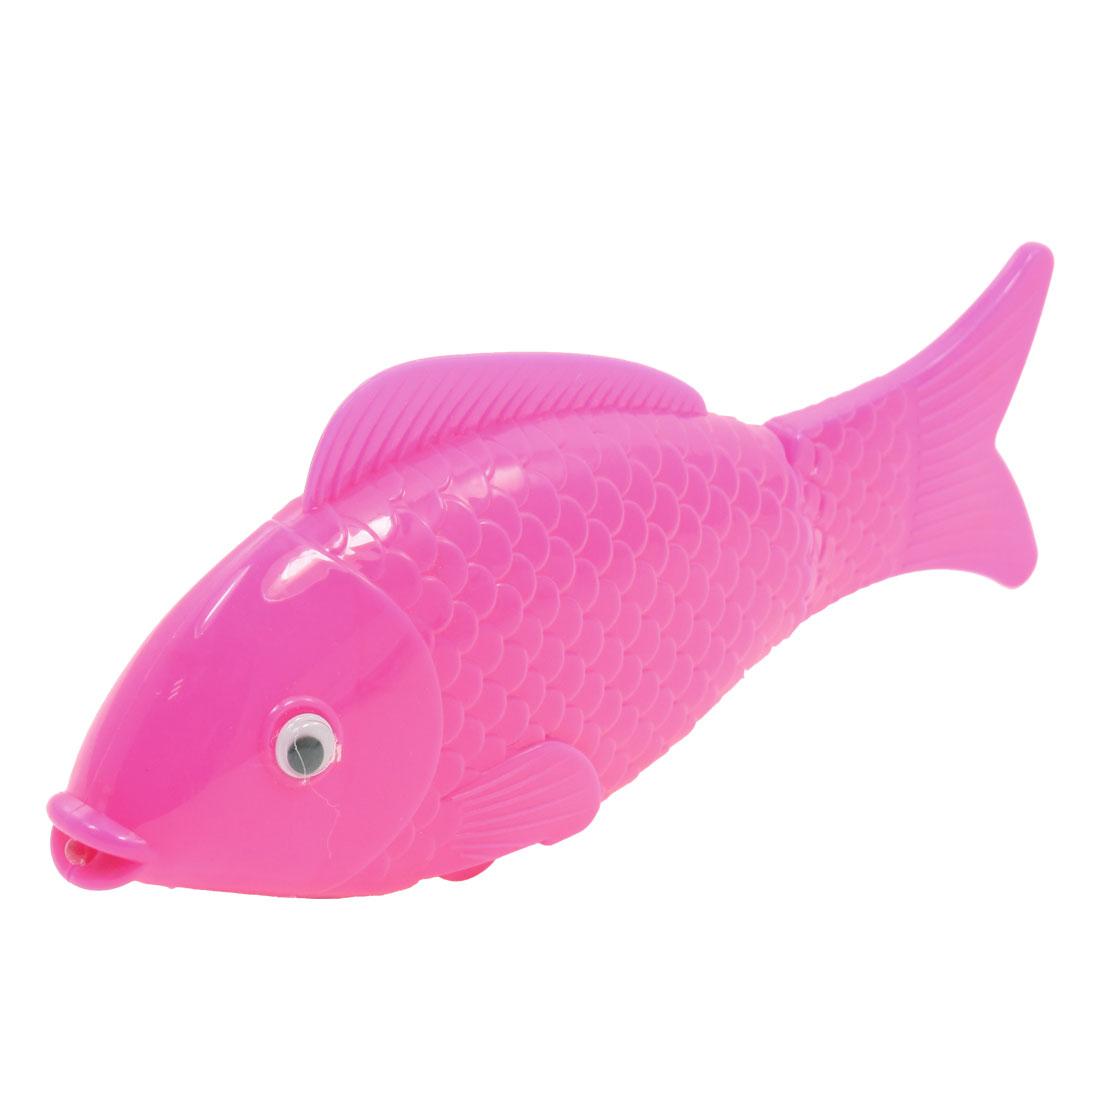 Child Magenta Fishtail Battery Power Plastic Moving Music Fish Toy